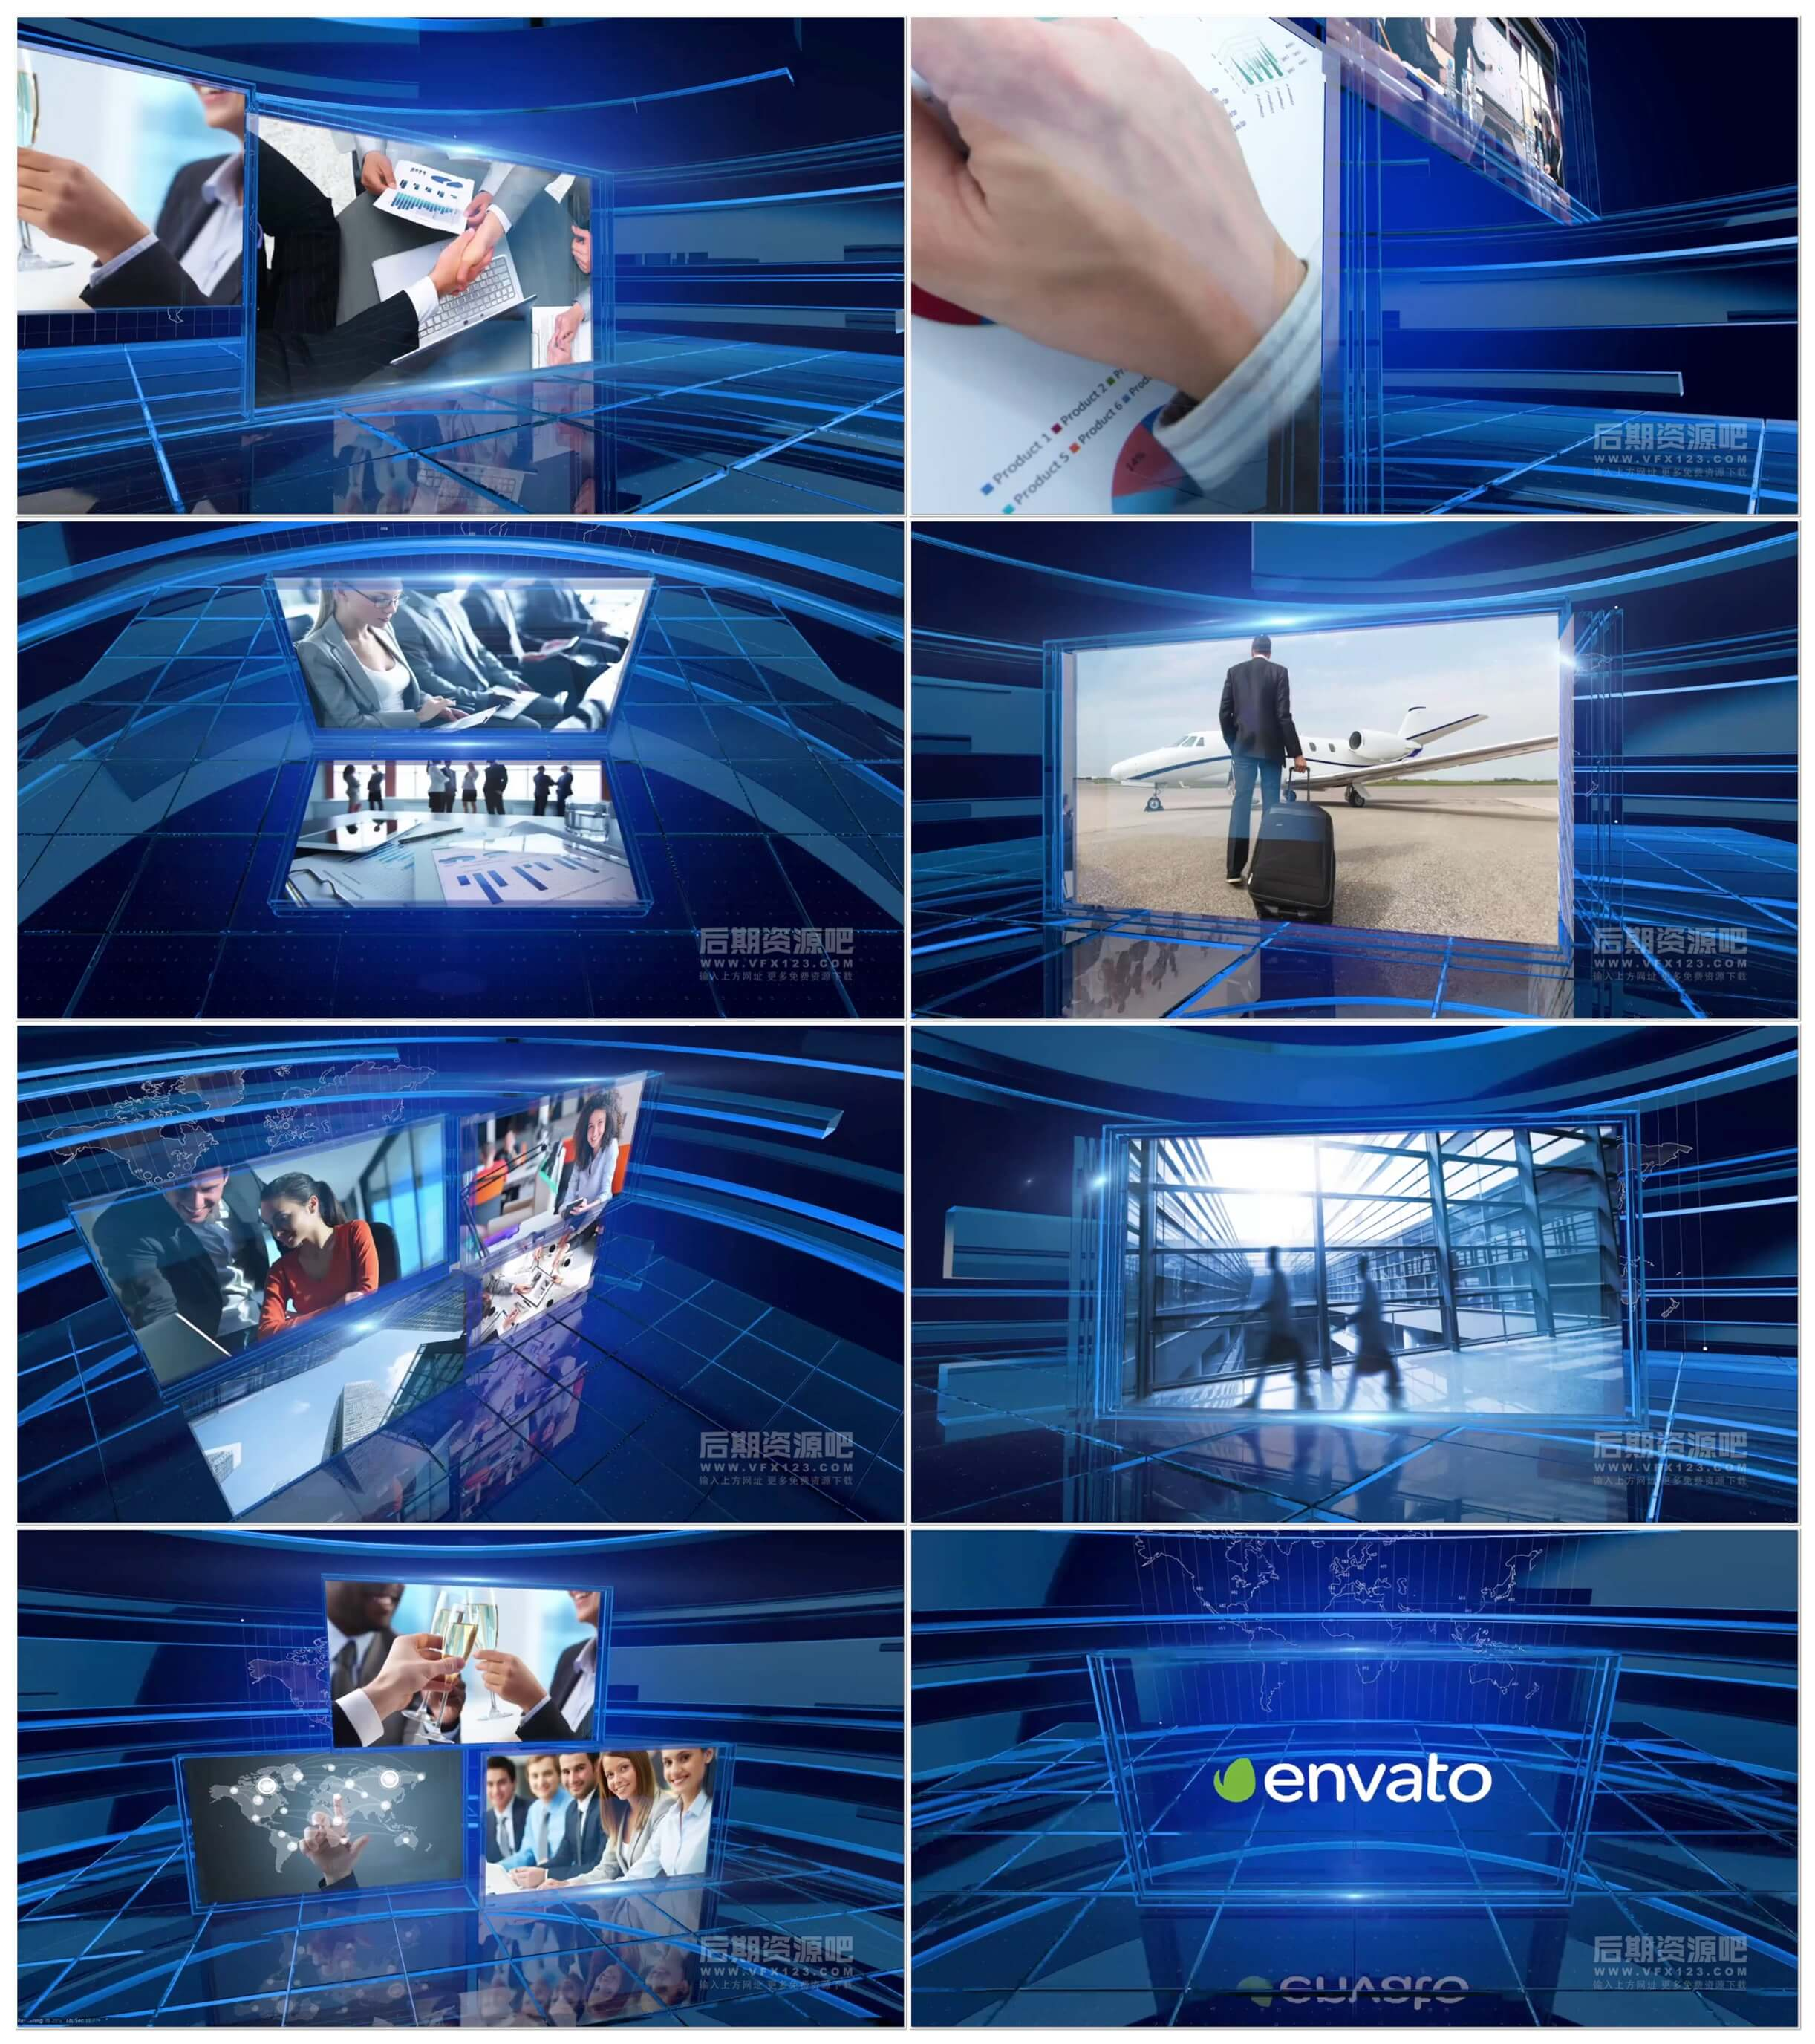 Motion模板 企业商务公司宣传图文展示片头模板 Corporate Displays